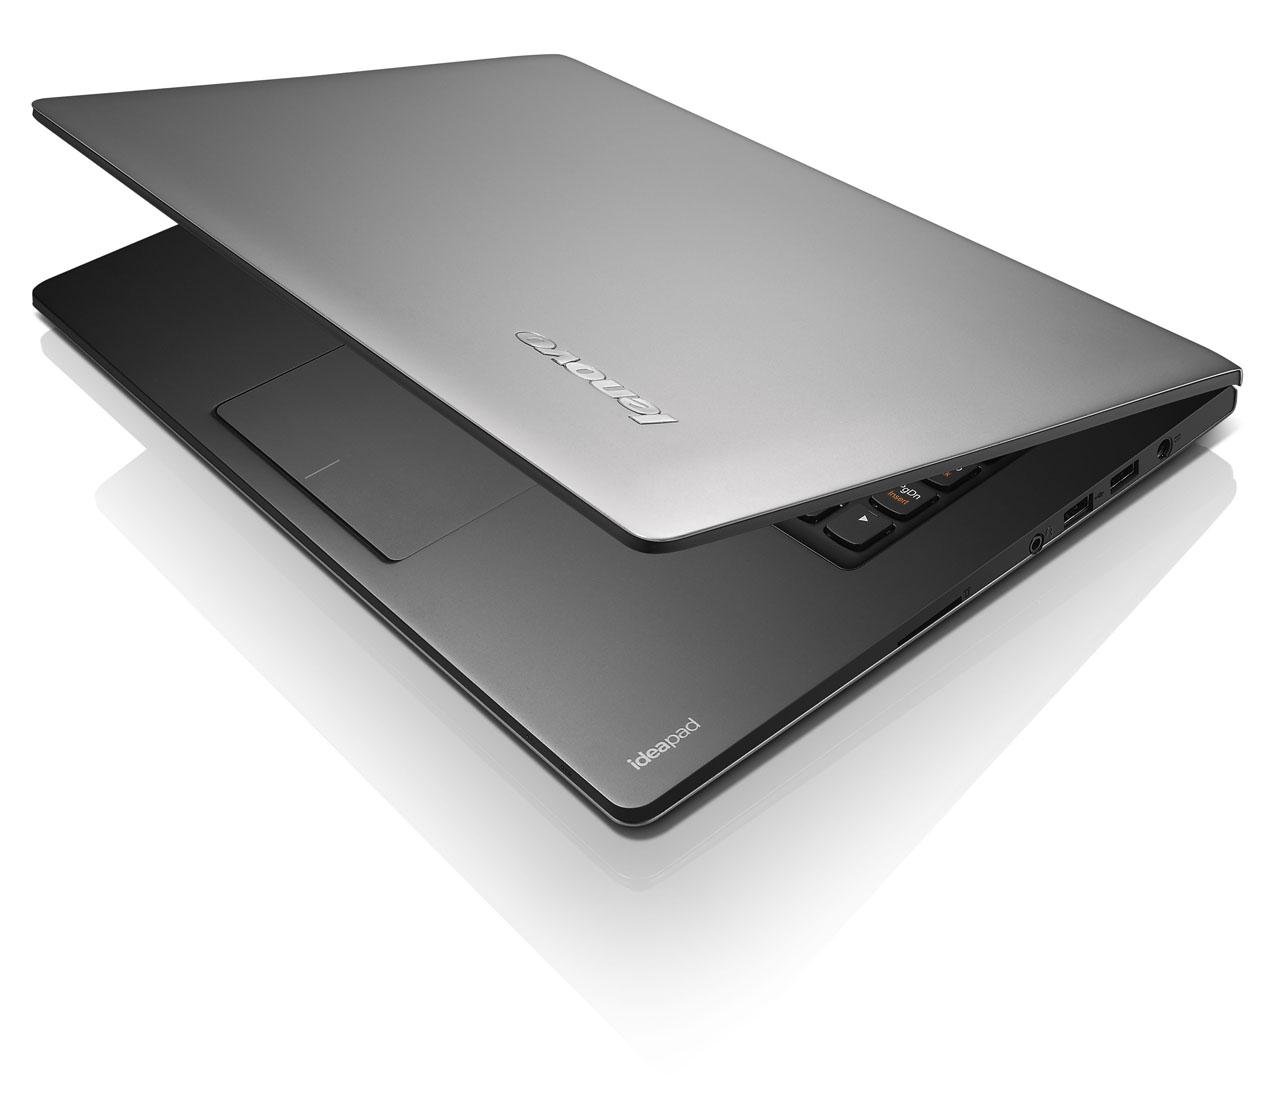 Sleekbook iz Lenova u Mikronisu i Lenovo Exclusive Storeu